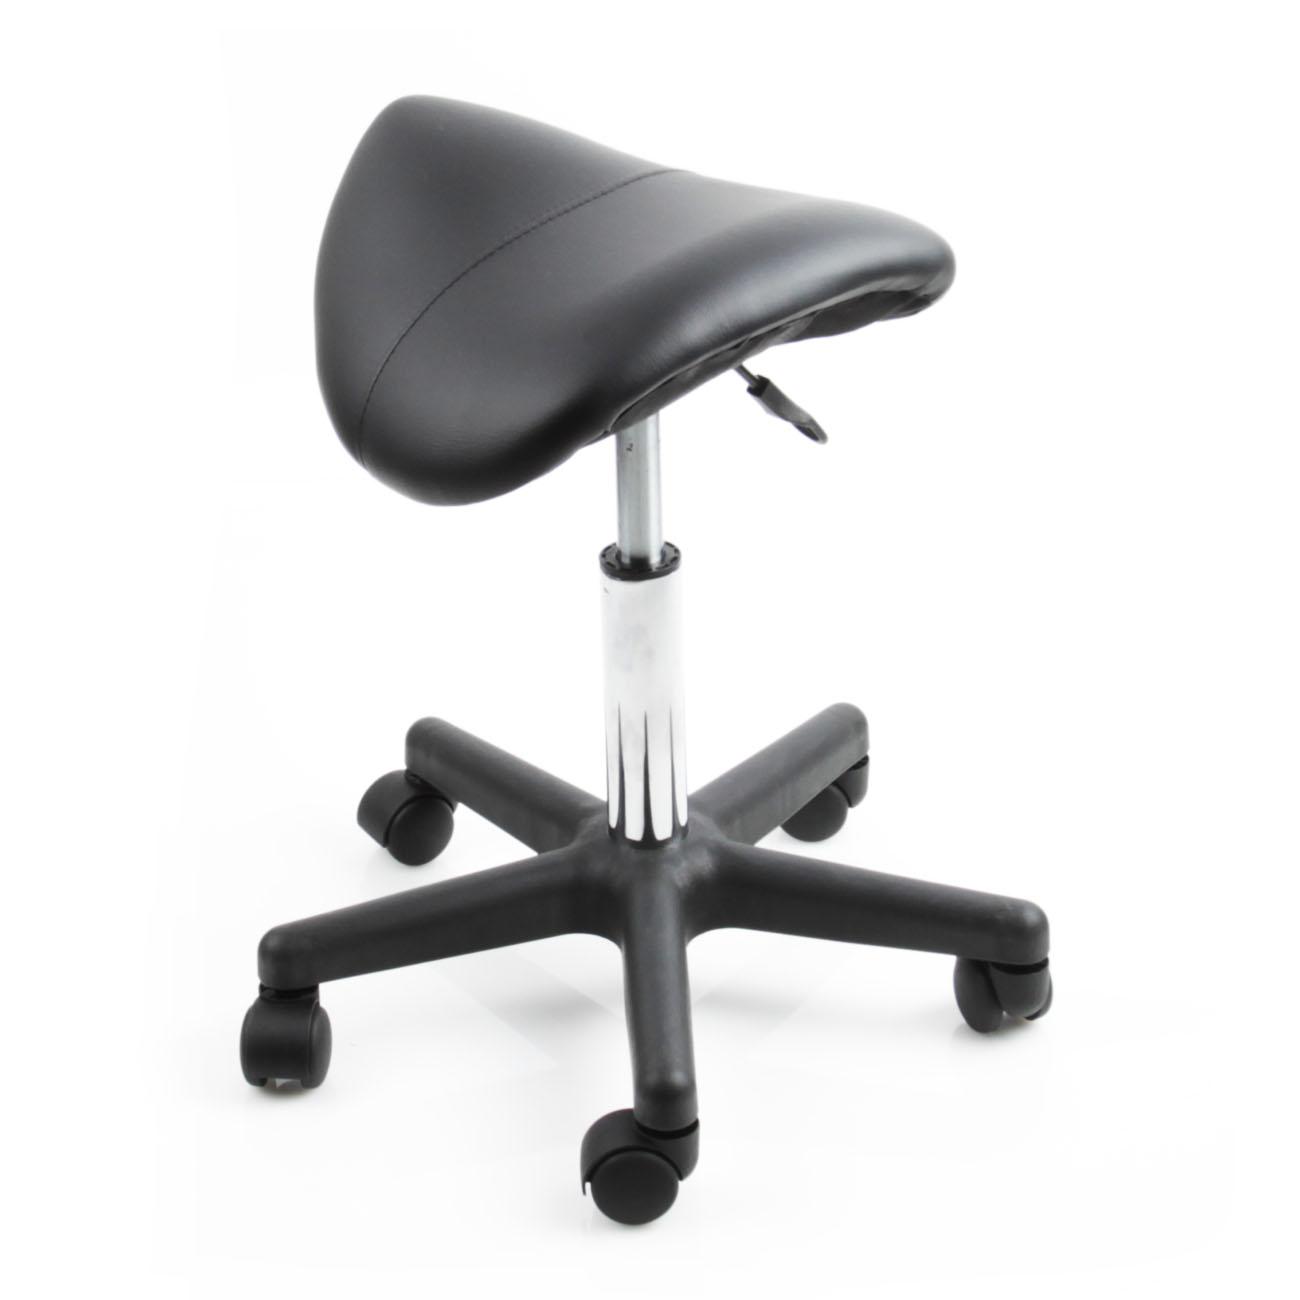 Black Saddle Salon Stool Beauty Wide Medical Chair Facial